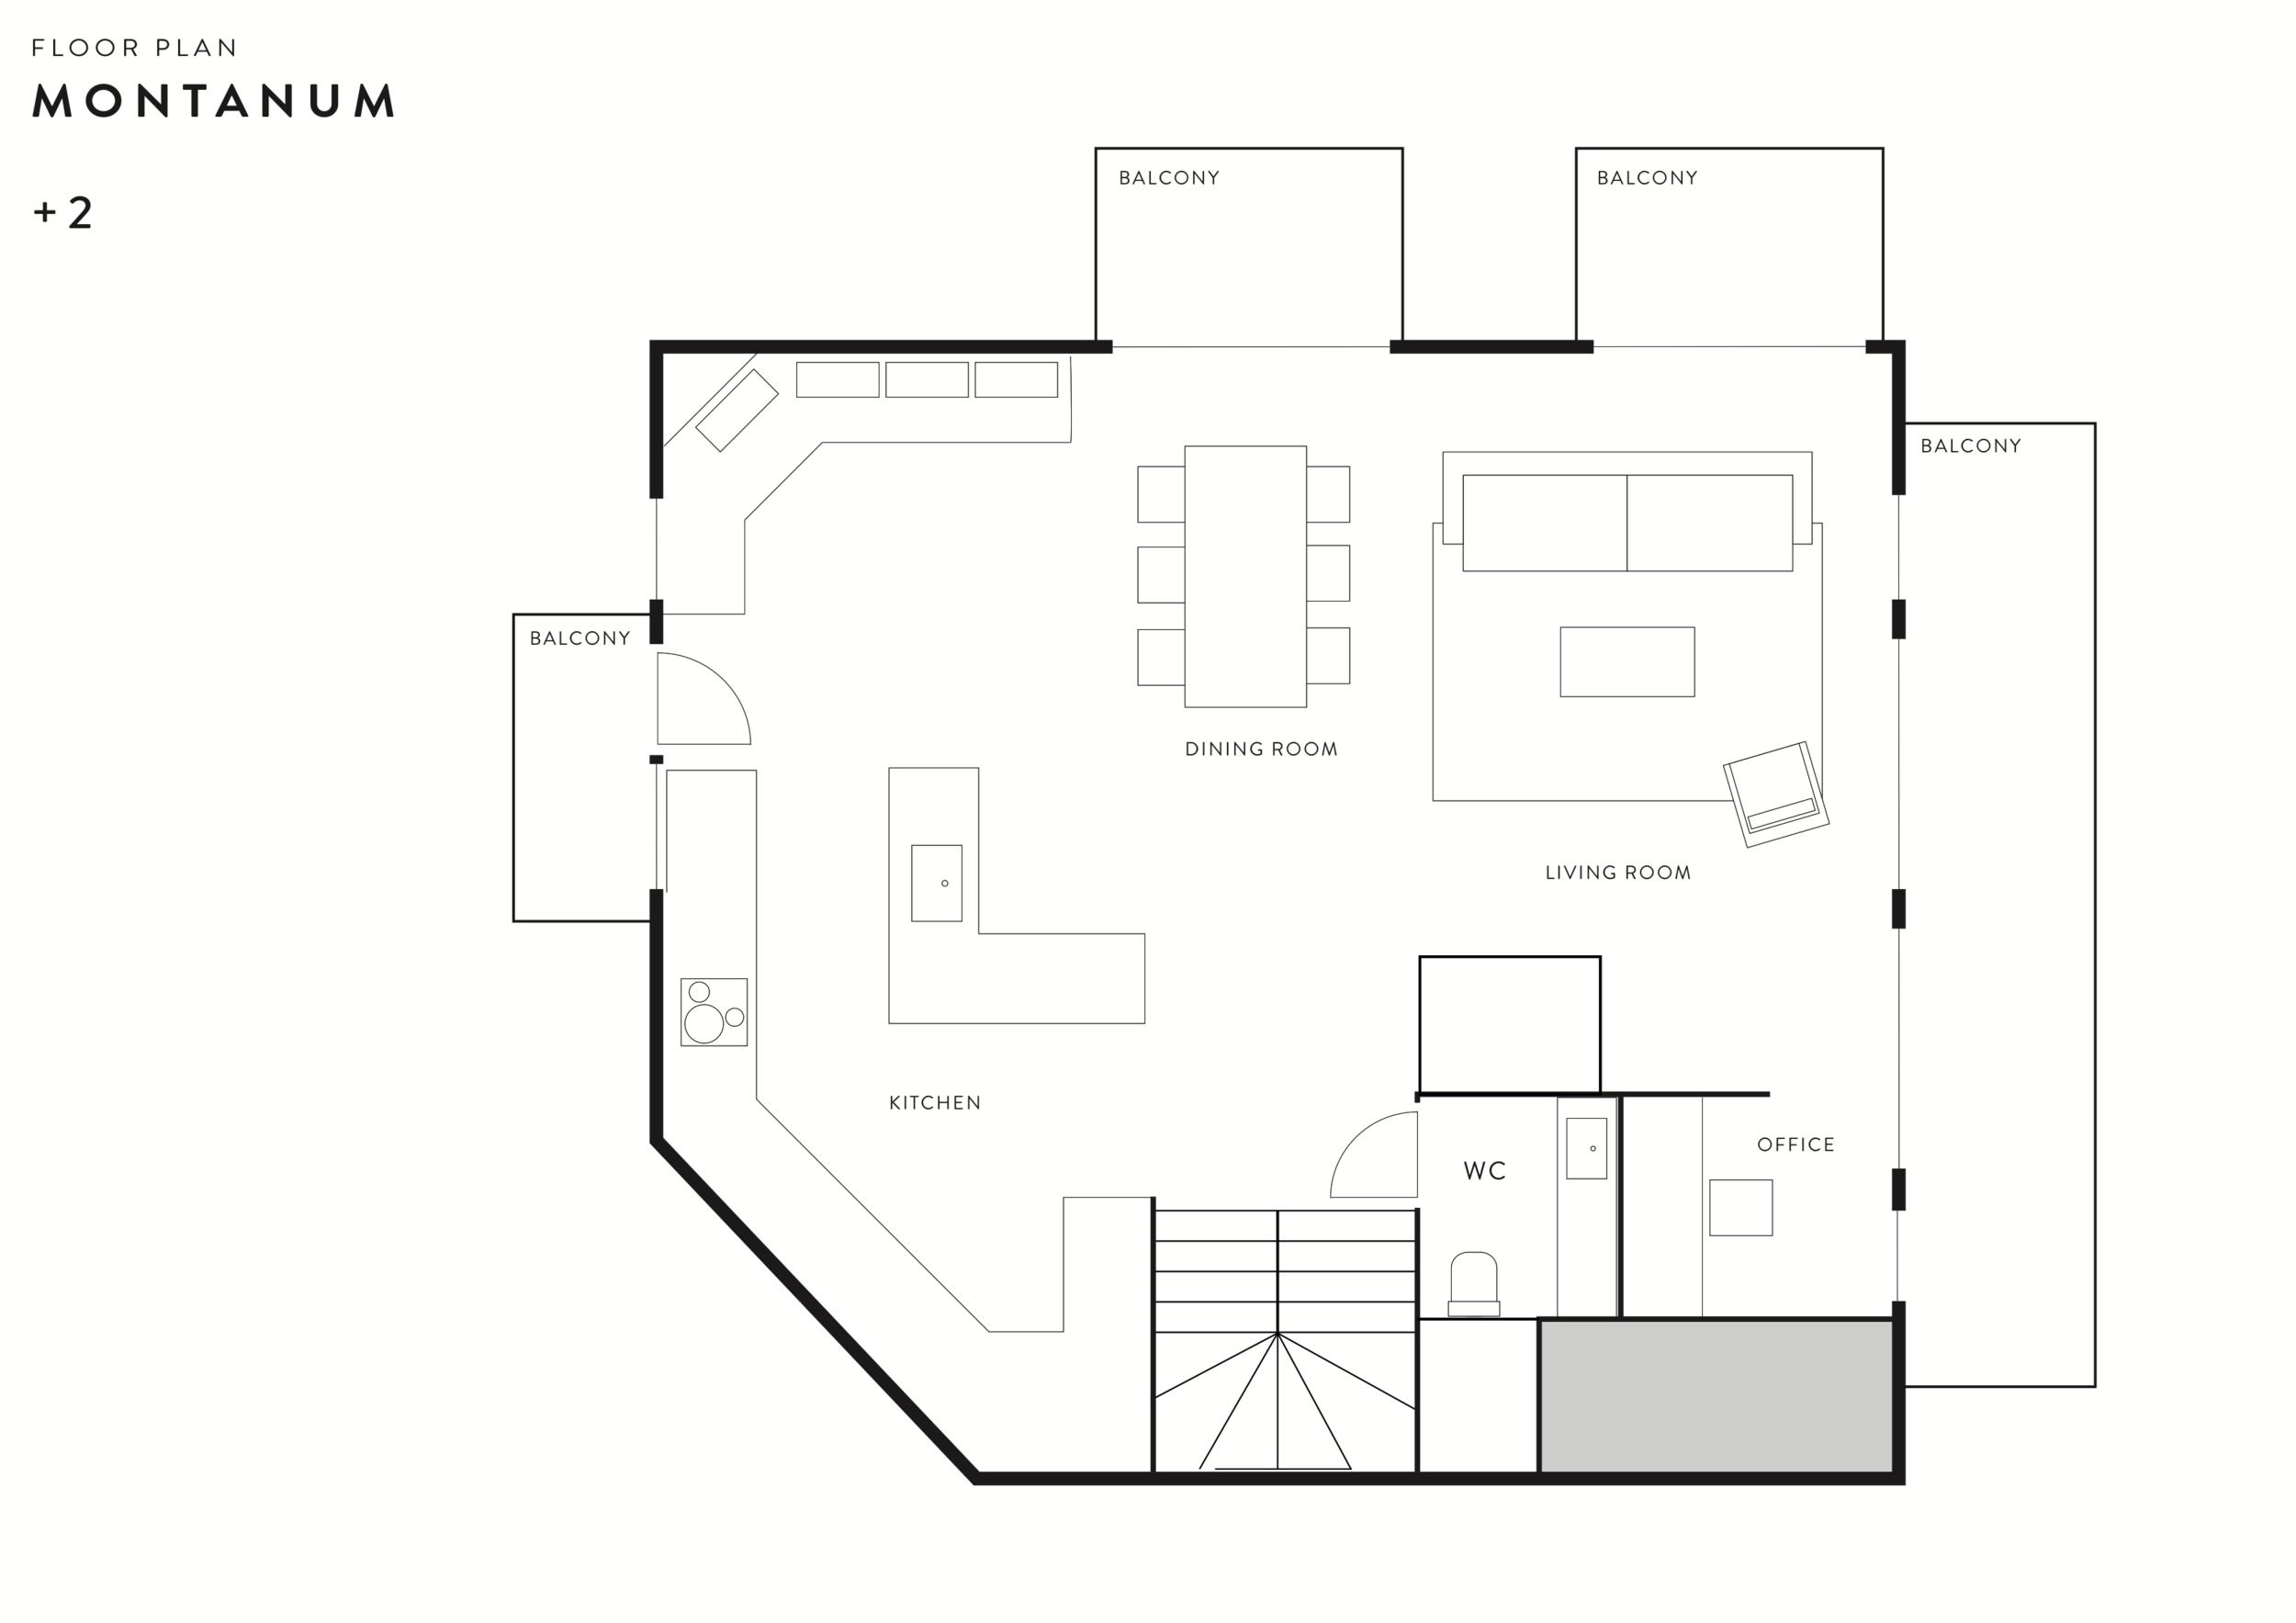 montanum-floor-plan-bumper-real-estate-france-courchevel-4.png